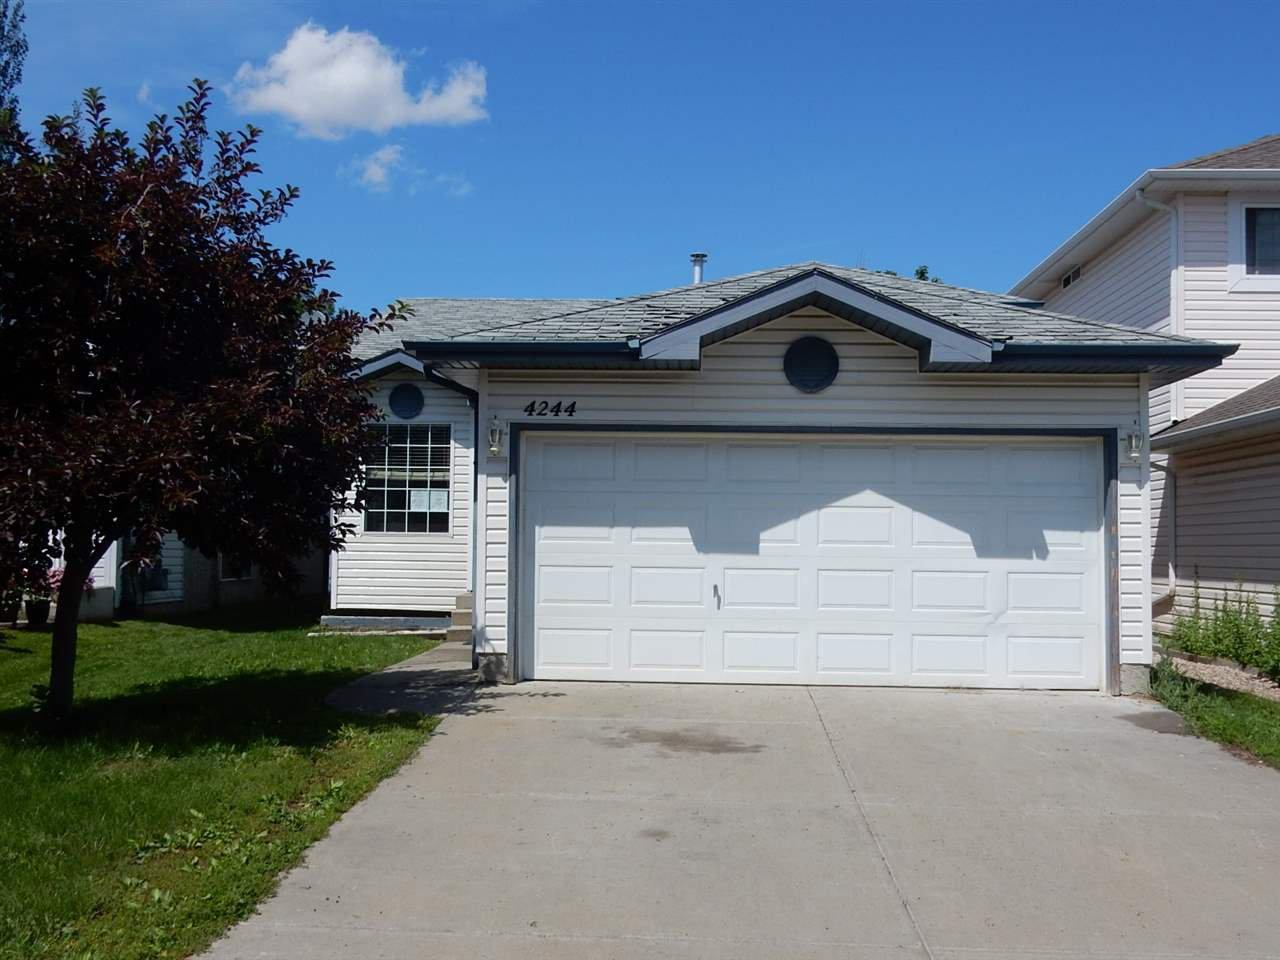 Main Photo: 4244 37B Avenue in Edmonton: Zone 29 House for sale : MLS®# E4172211